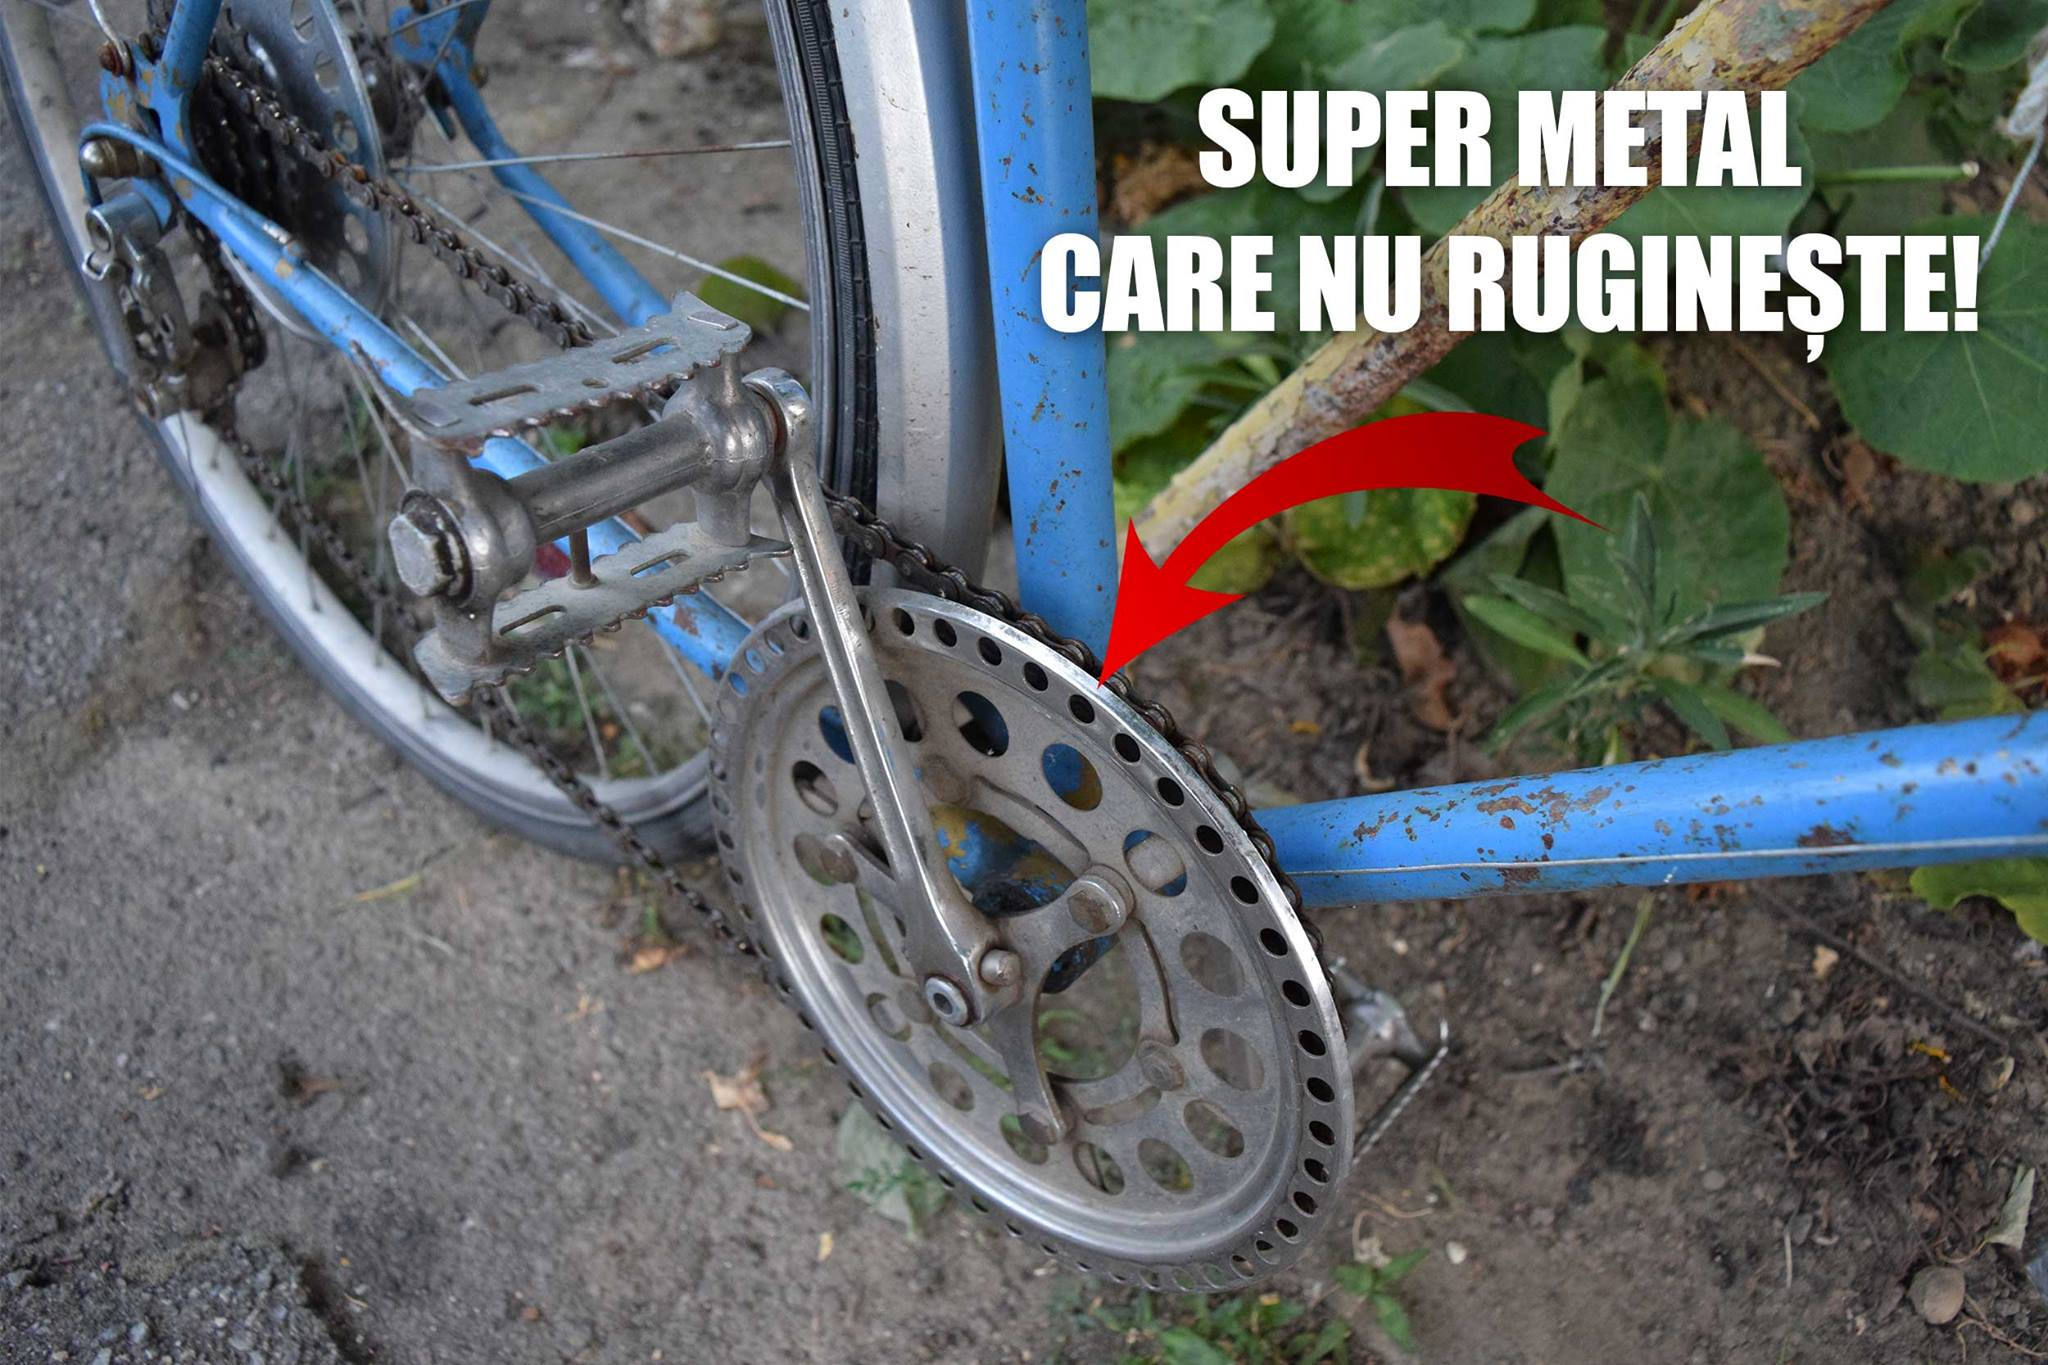 Bicicleta super metal care nu rugineste - Toma Grozavescu